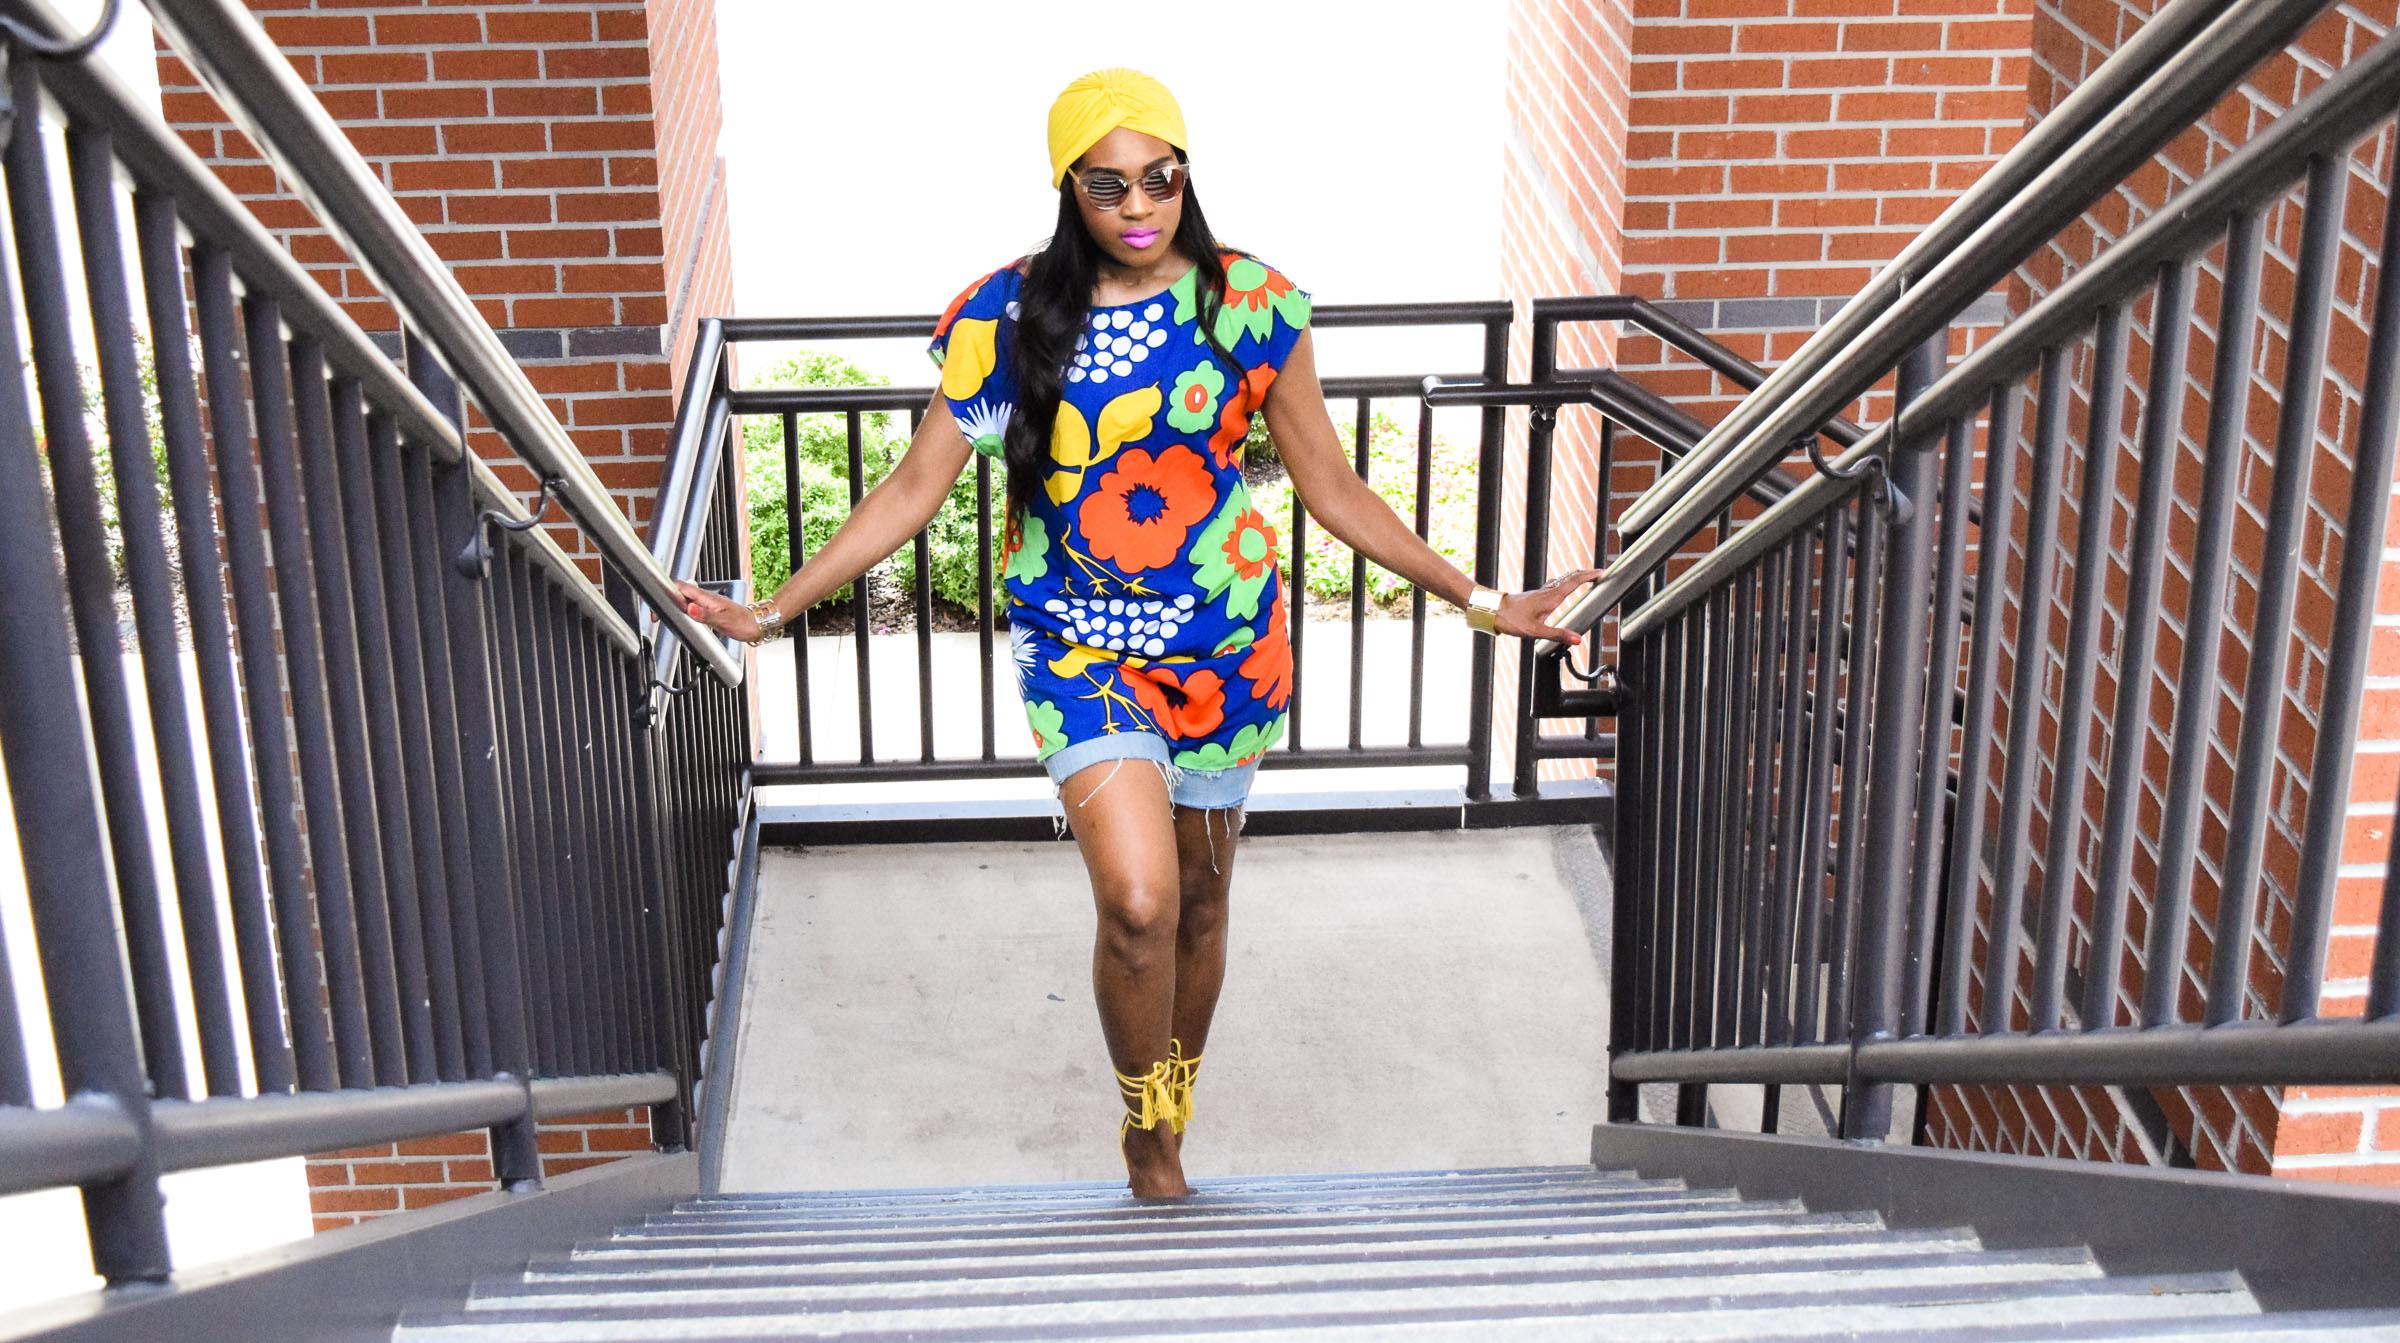 Style-Files-Target-Marimeko-collection -floral-tunic-justfab-tayrey-yellow-fringe-heels-sandals-yellow-turban-asos-denim-choker-oohlalablog-10